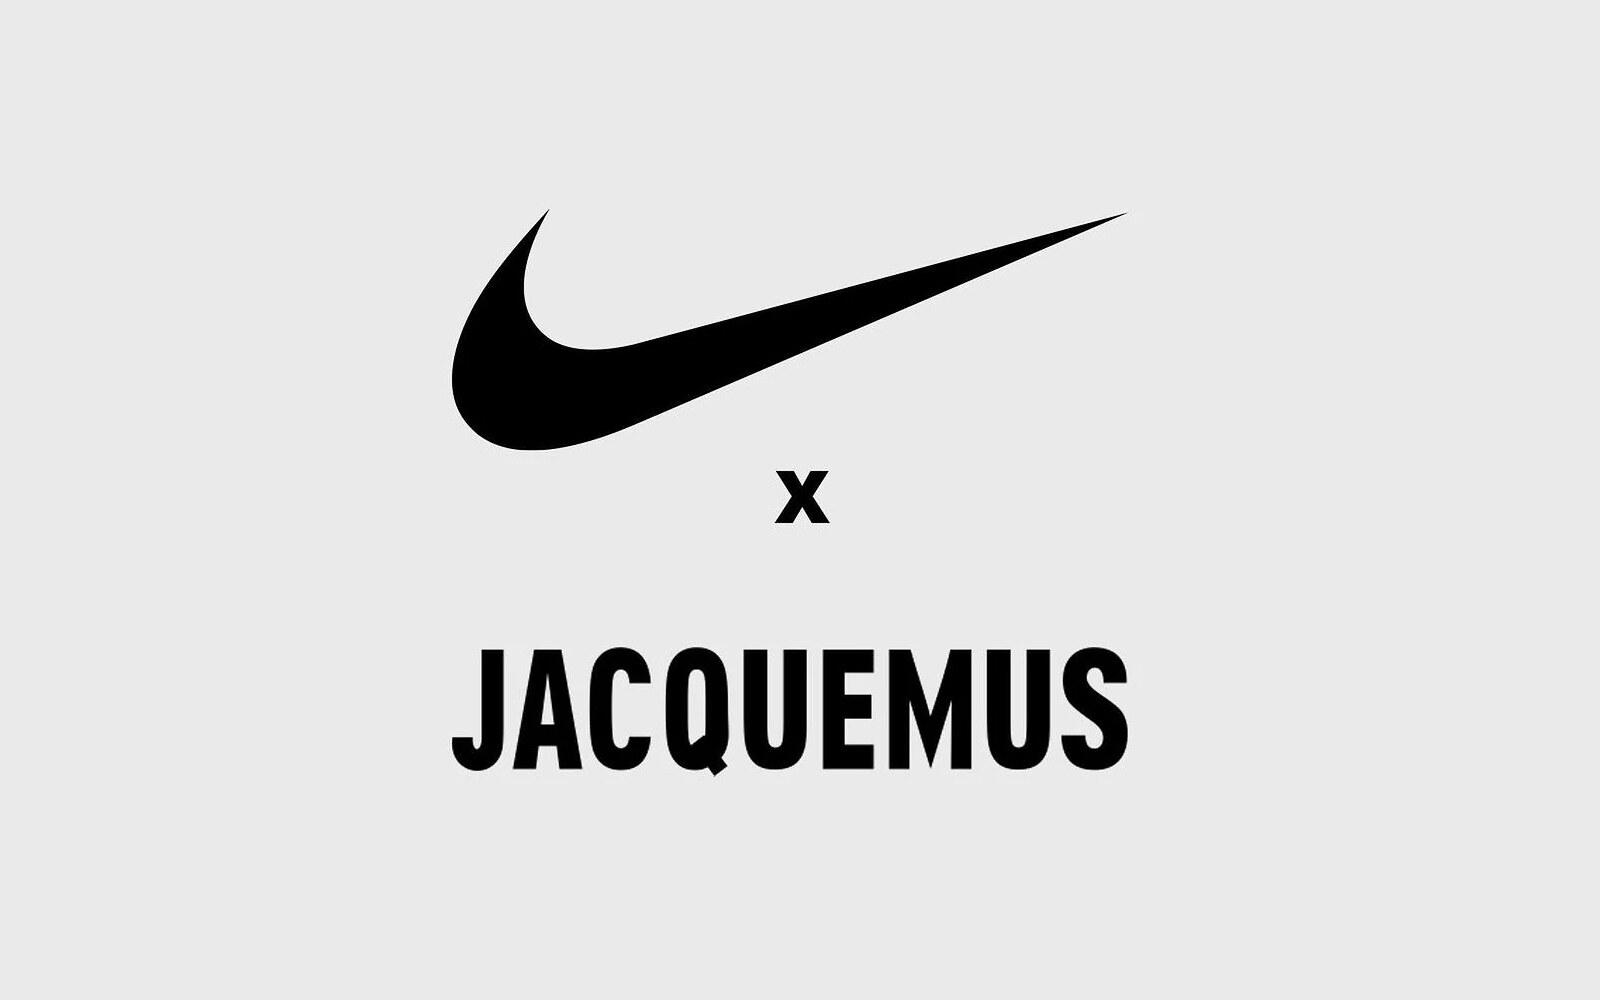 Jacquemus x Nike